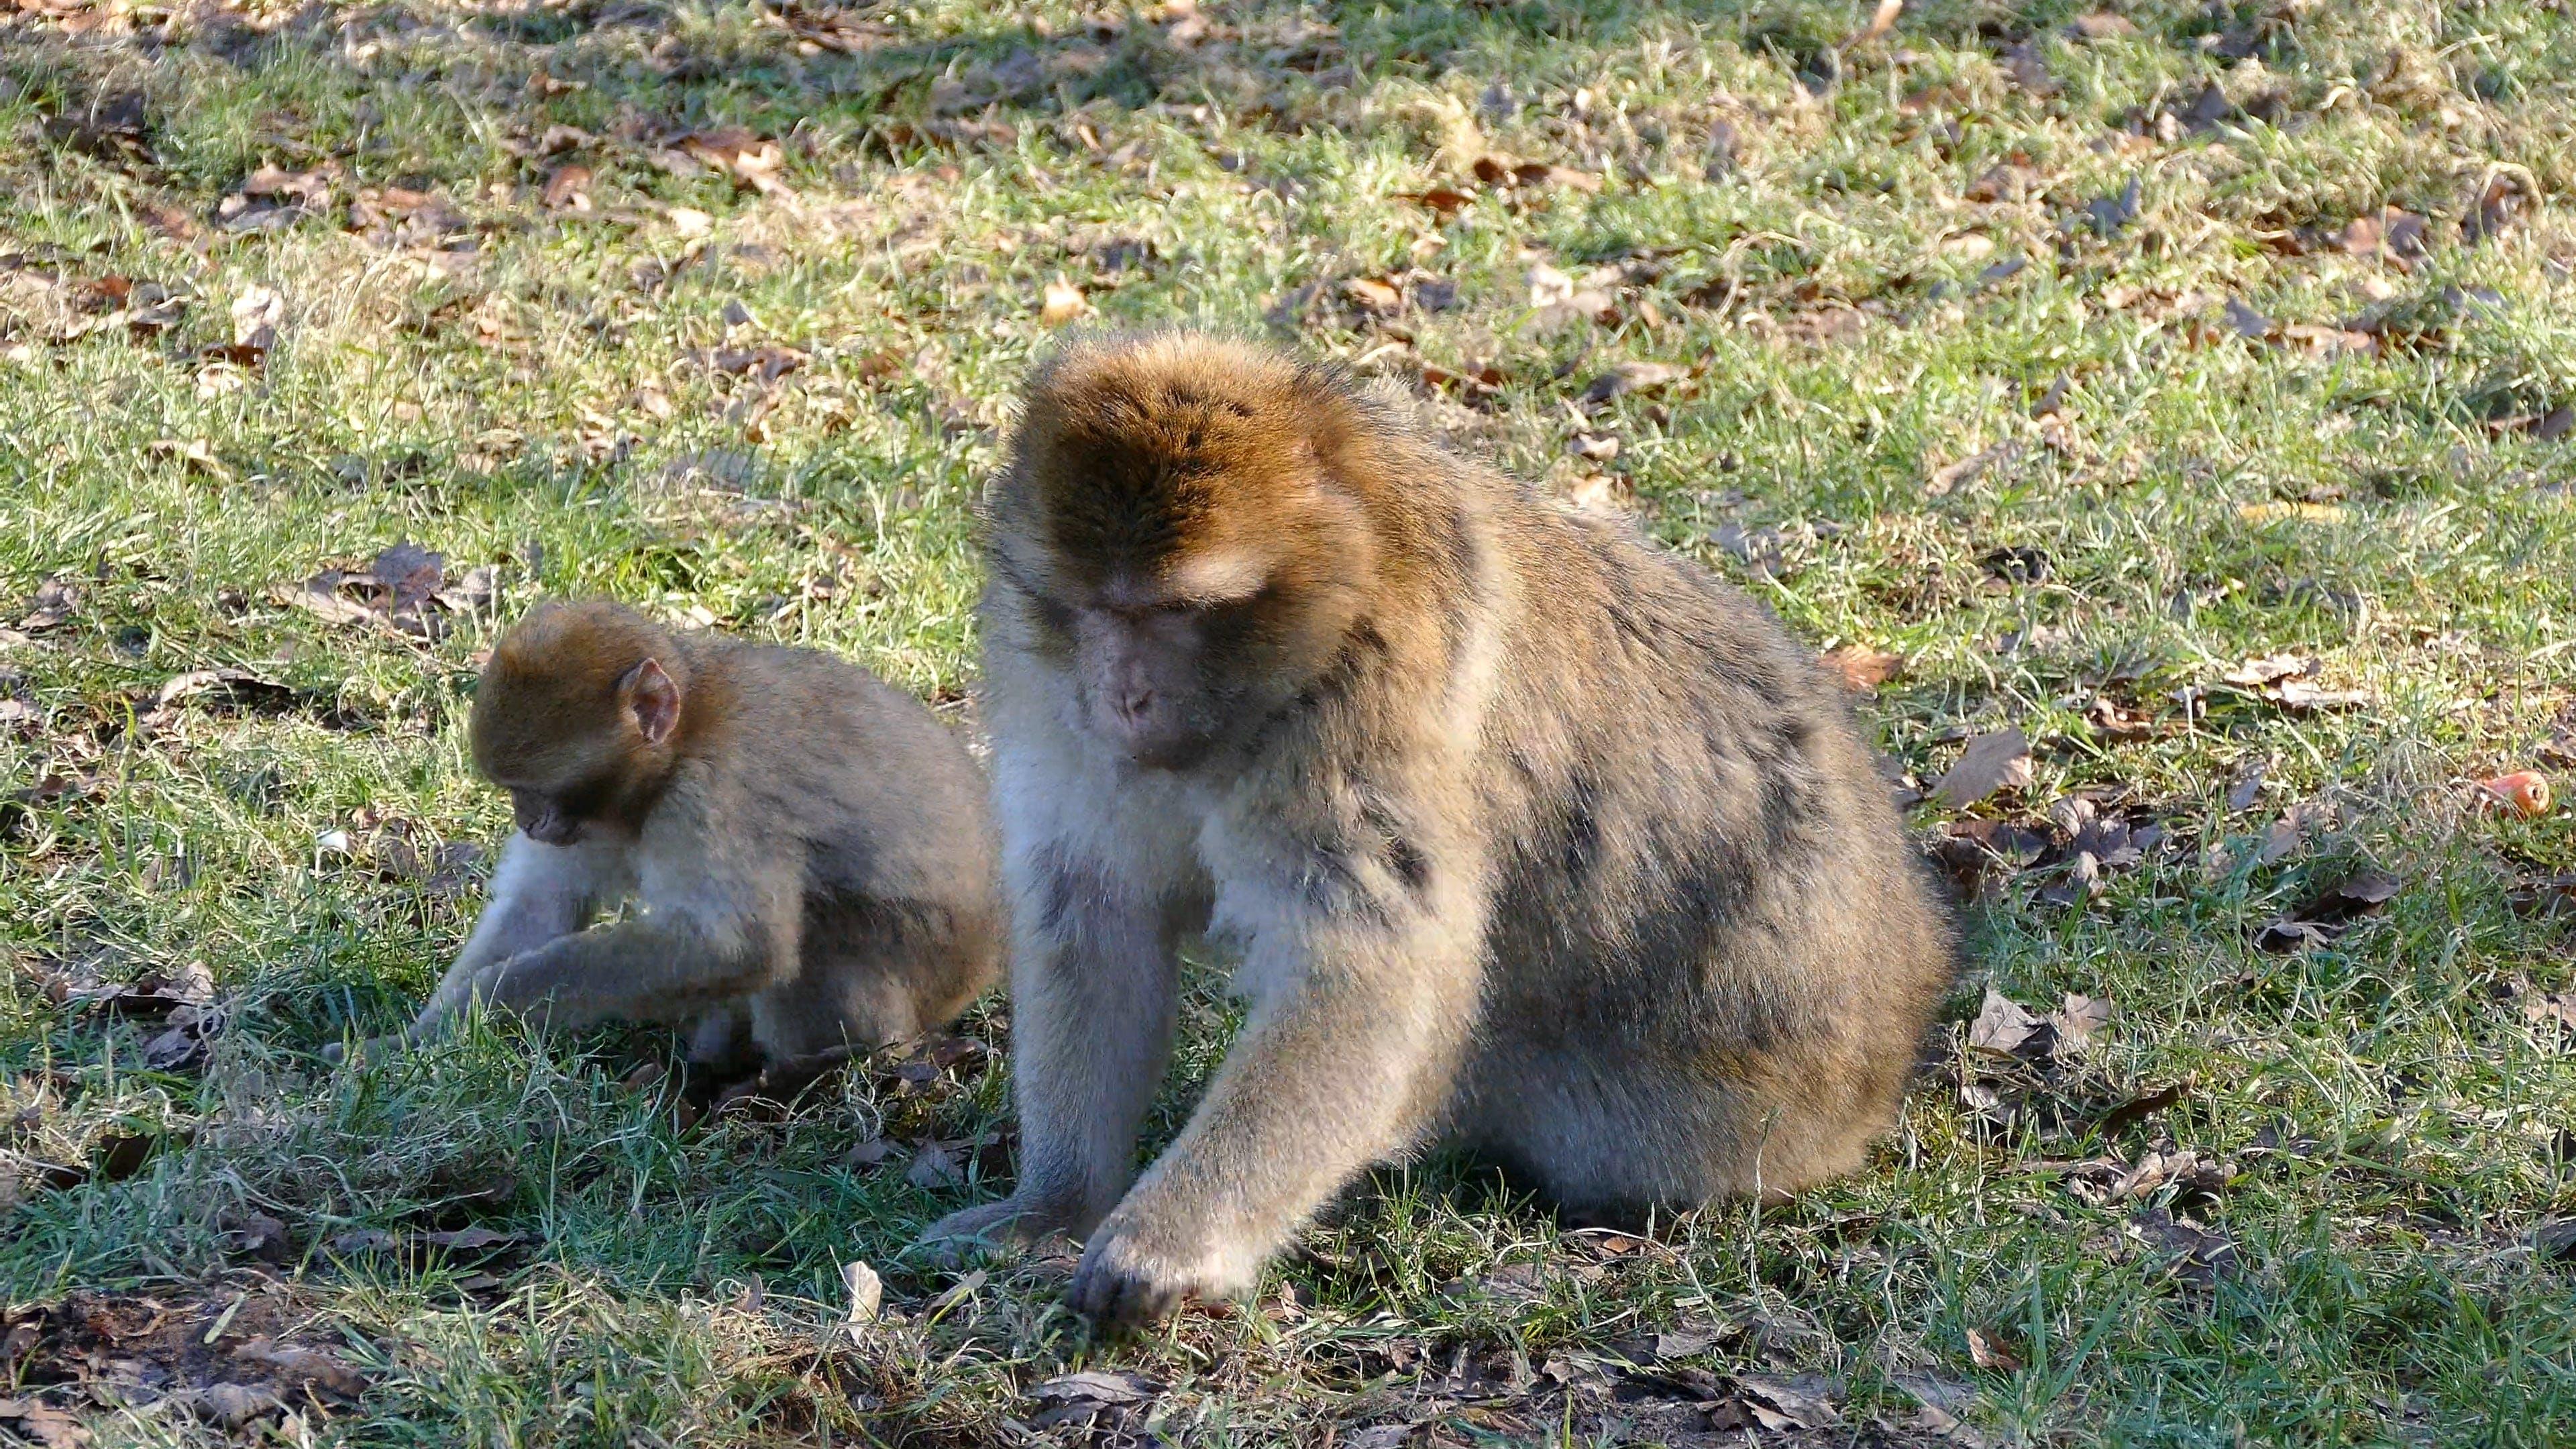 Video Of Monkeys Looking For Food